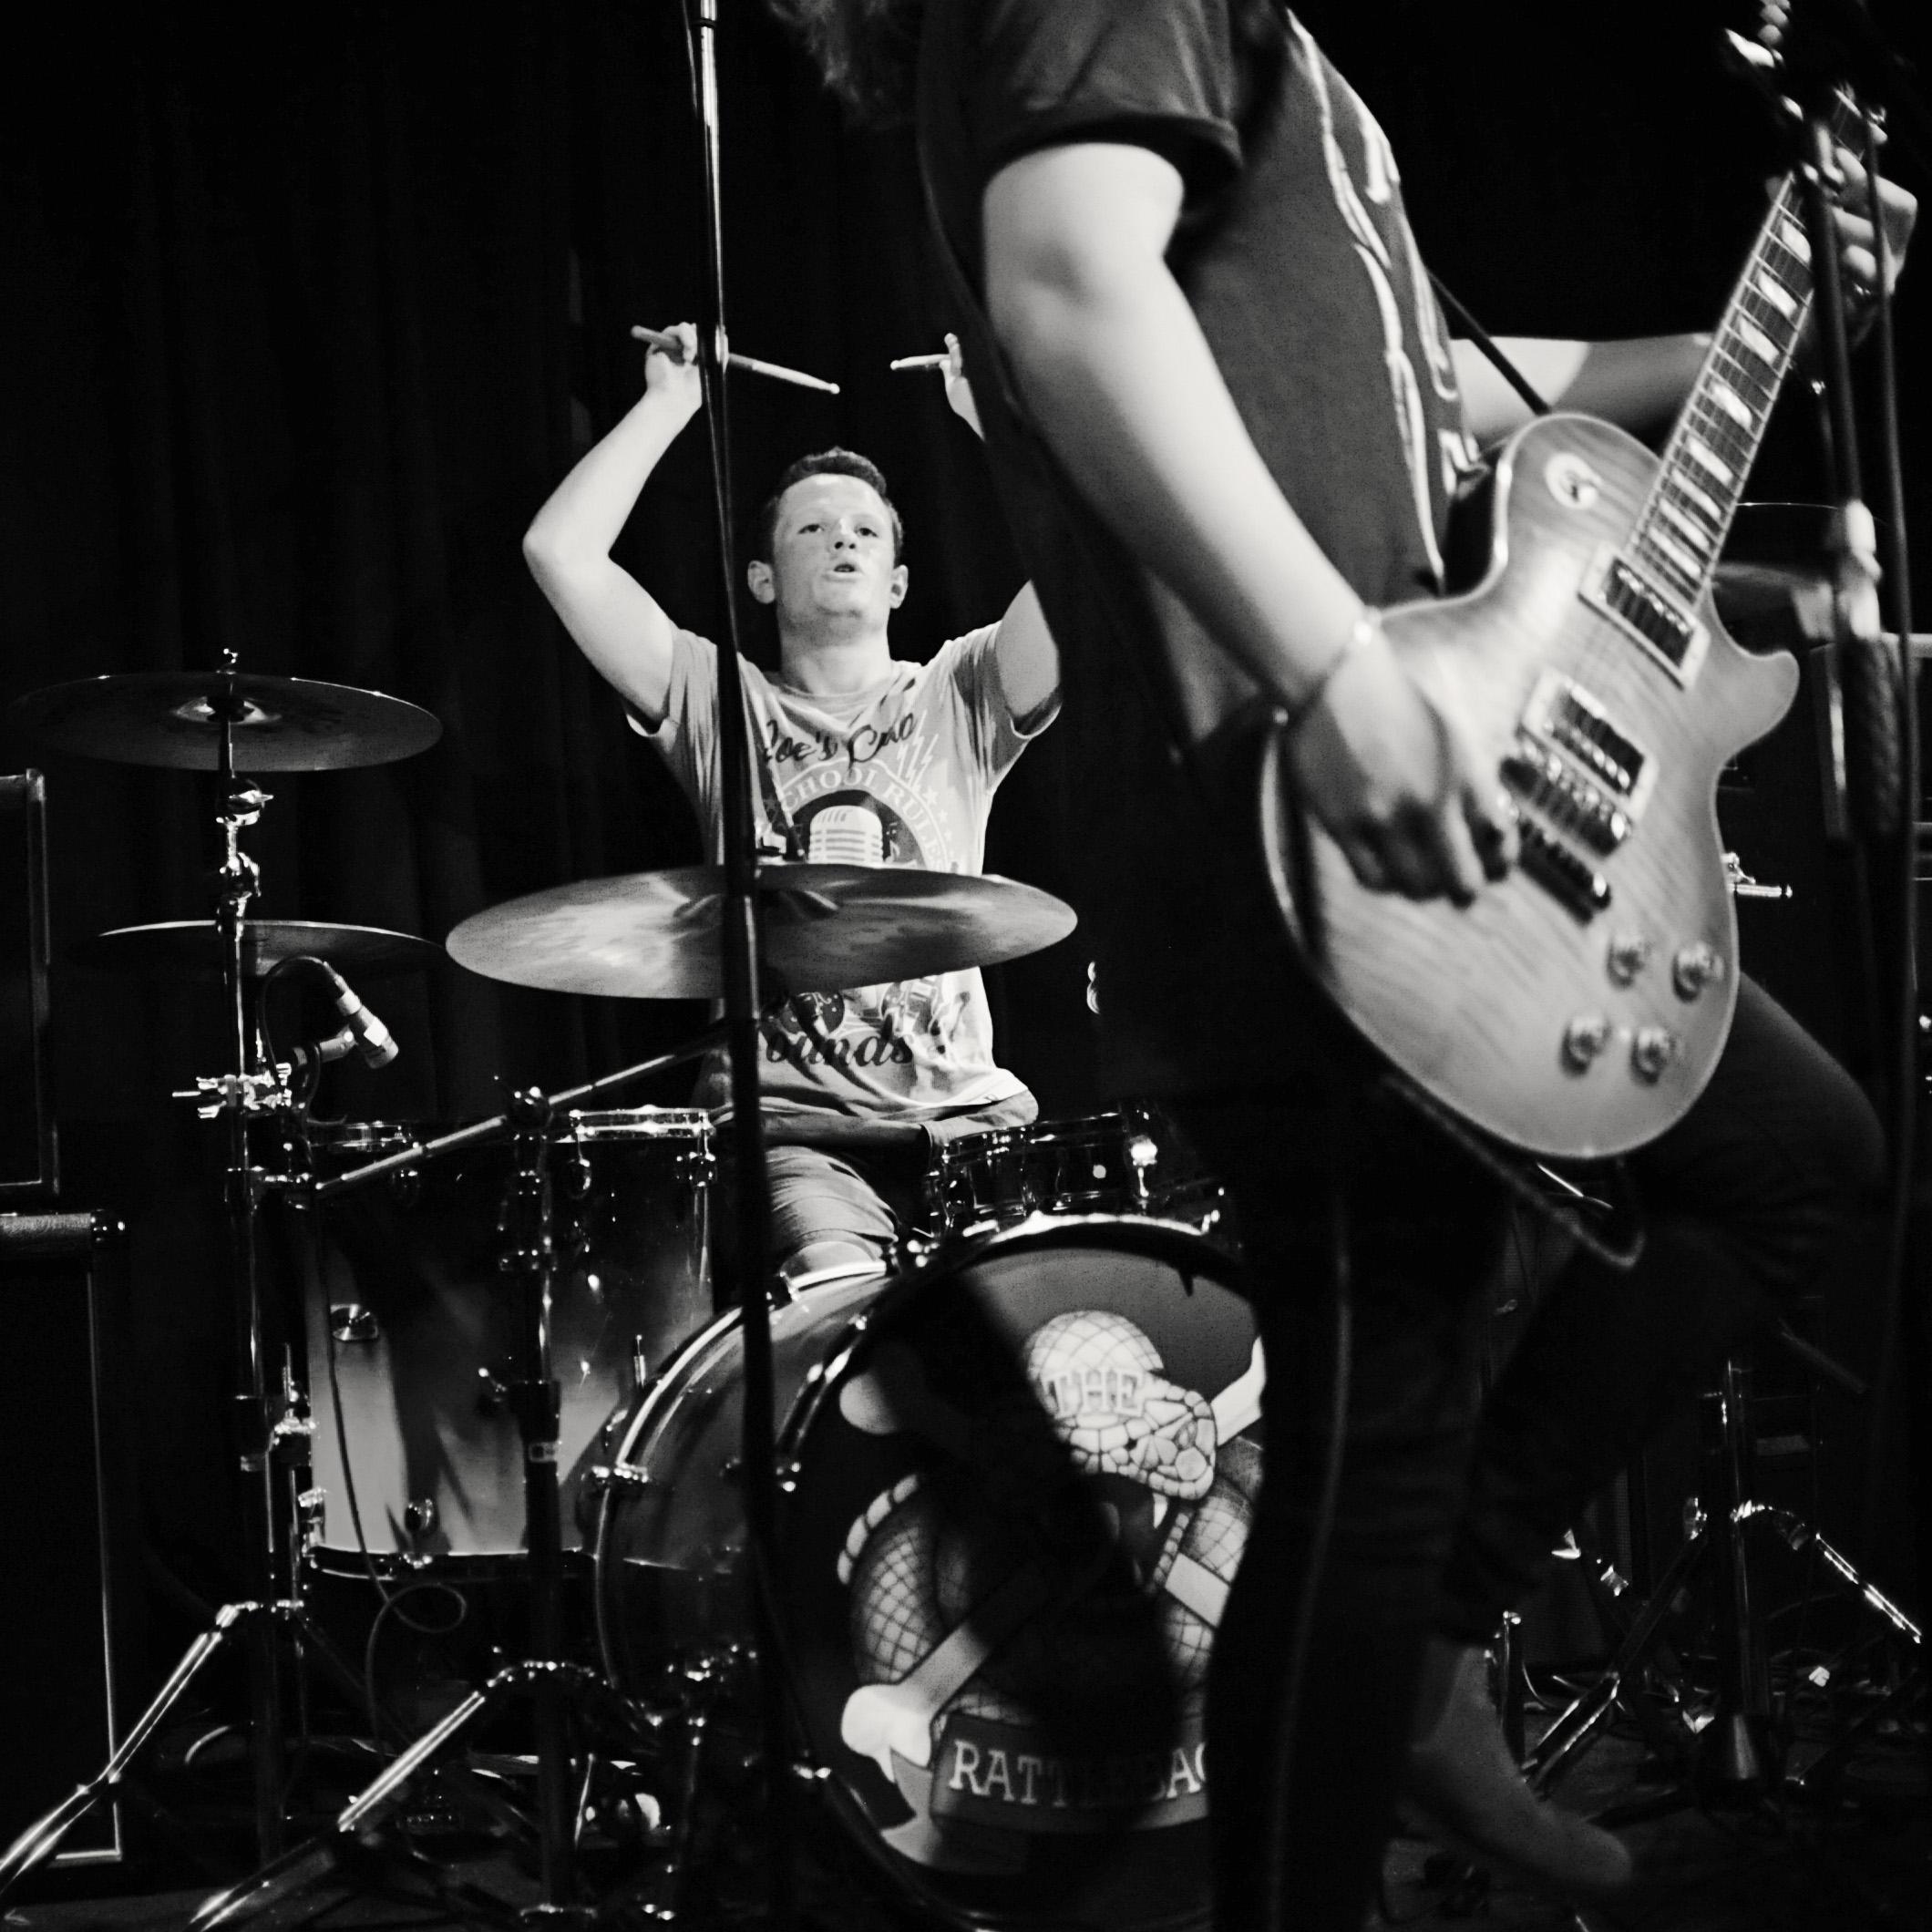 Joe Donegan Drumming Live B+W